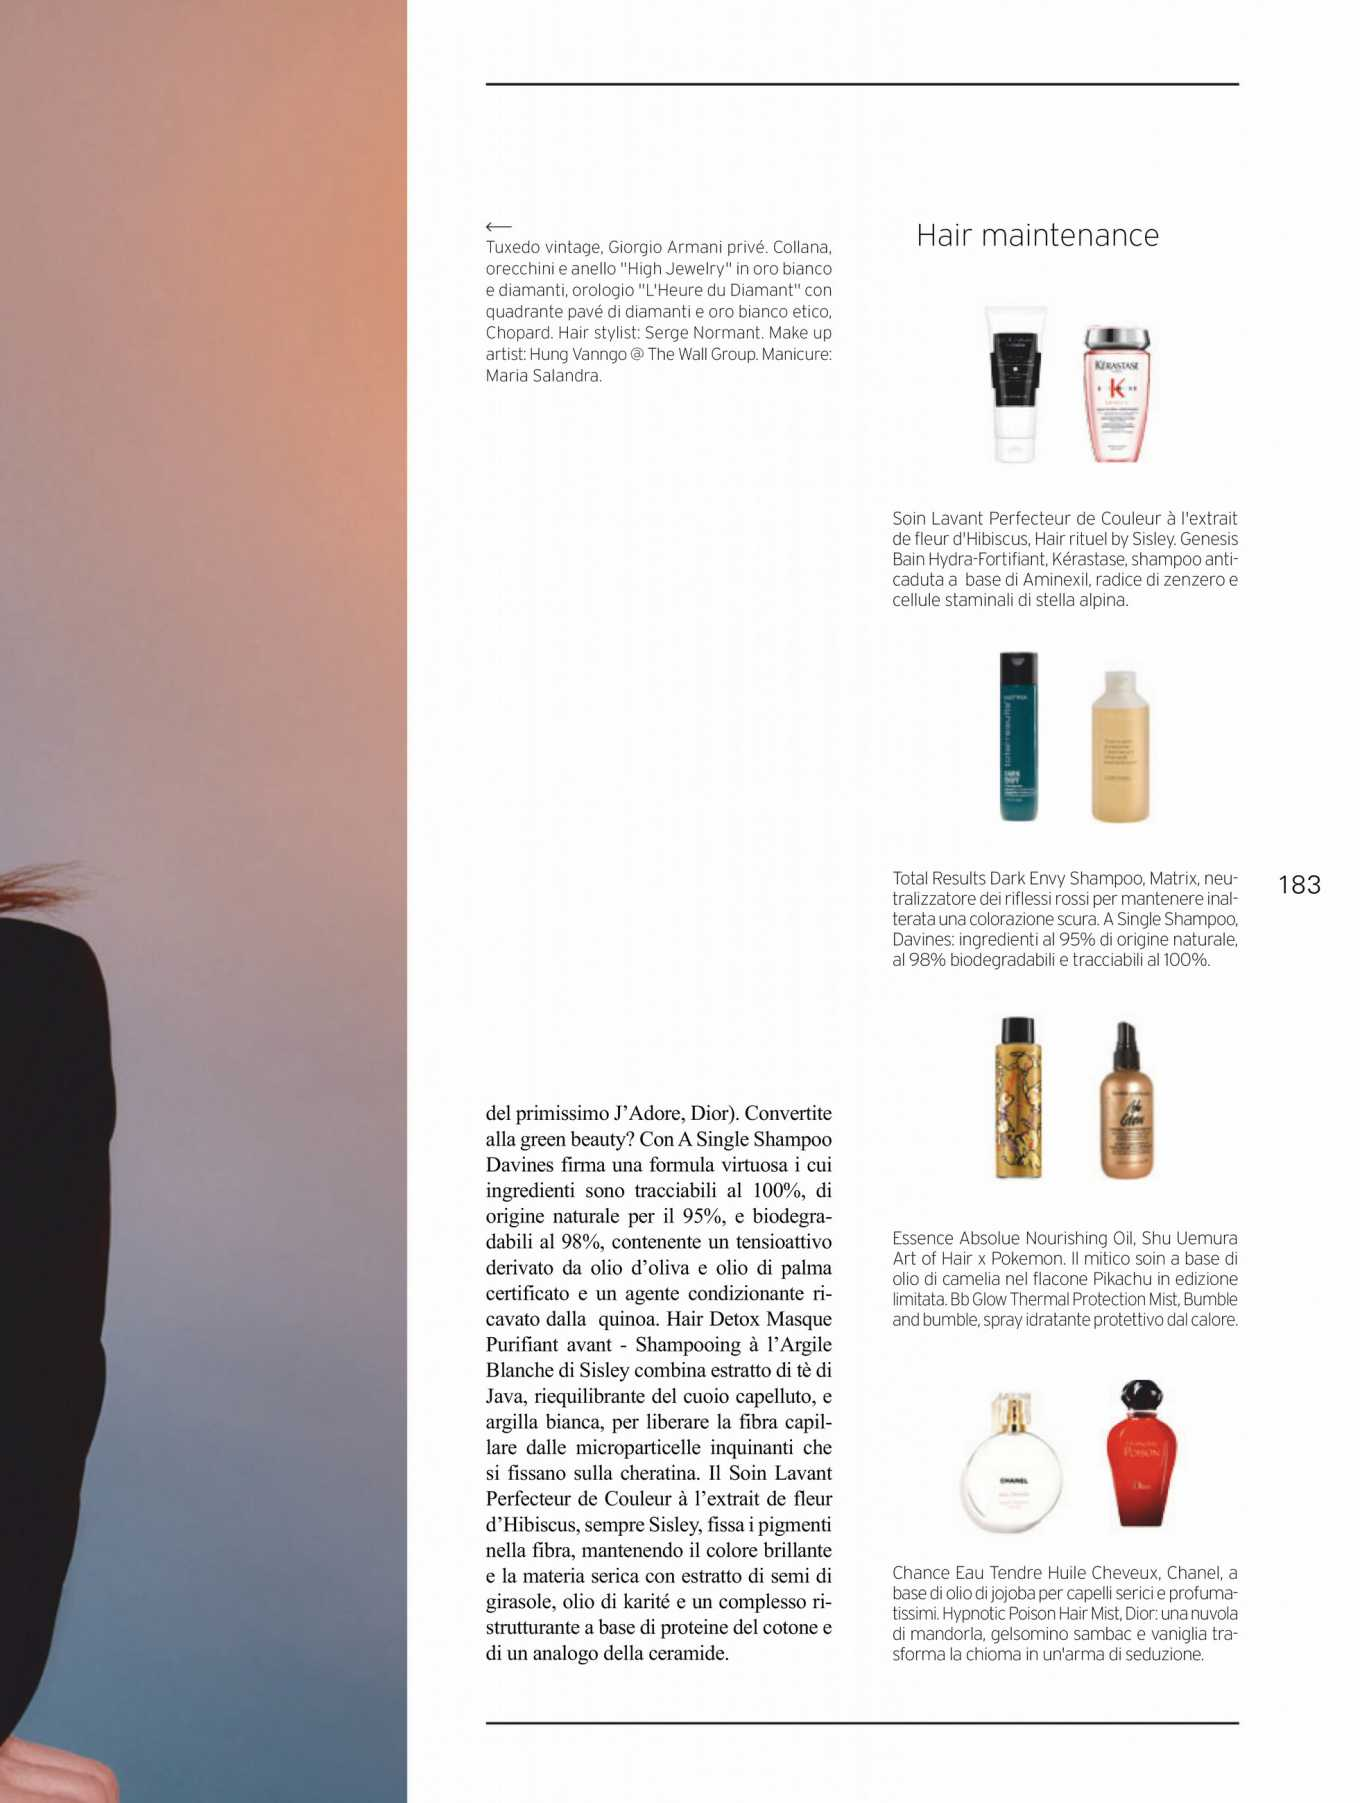 Julianne Moore 2020 : Julianne Moore – LOfficiel magazine (Italia – February 2020)-02